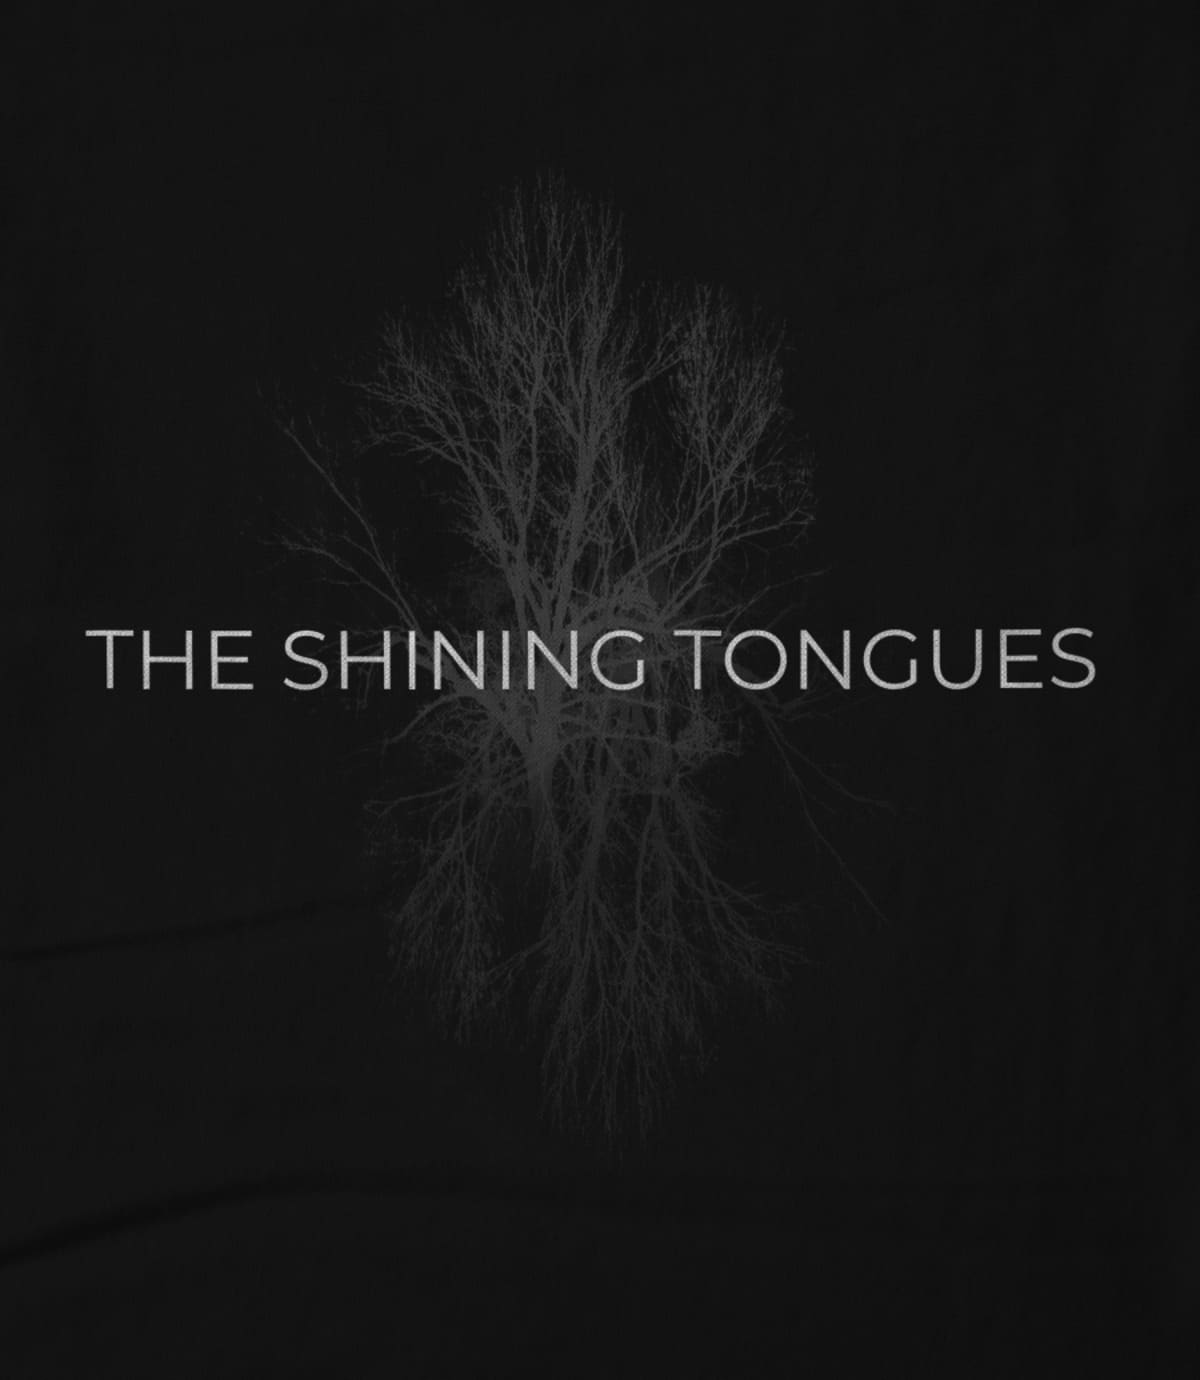 The Shining Tongues